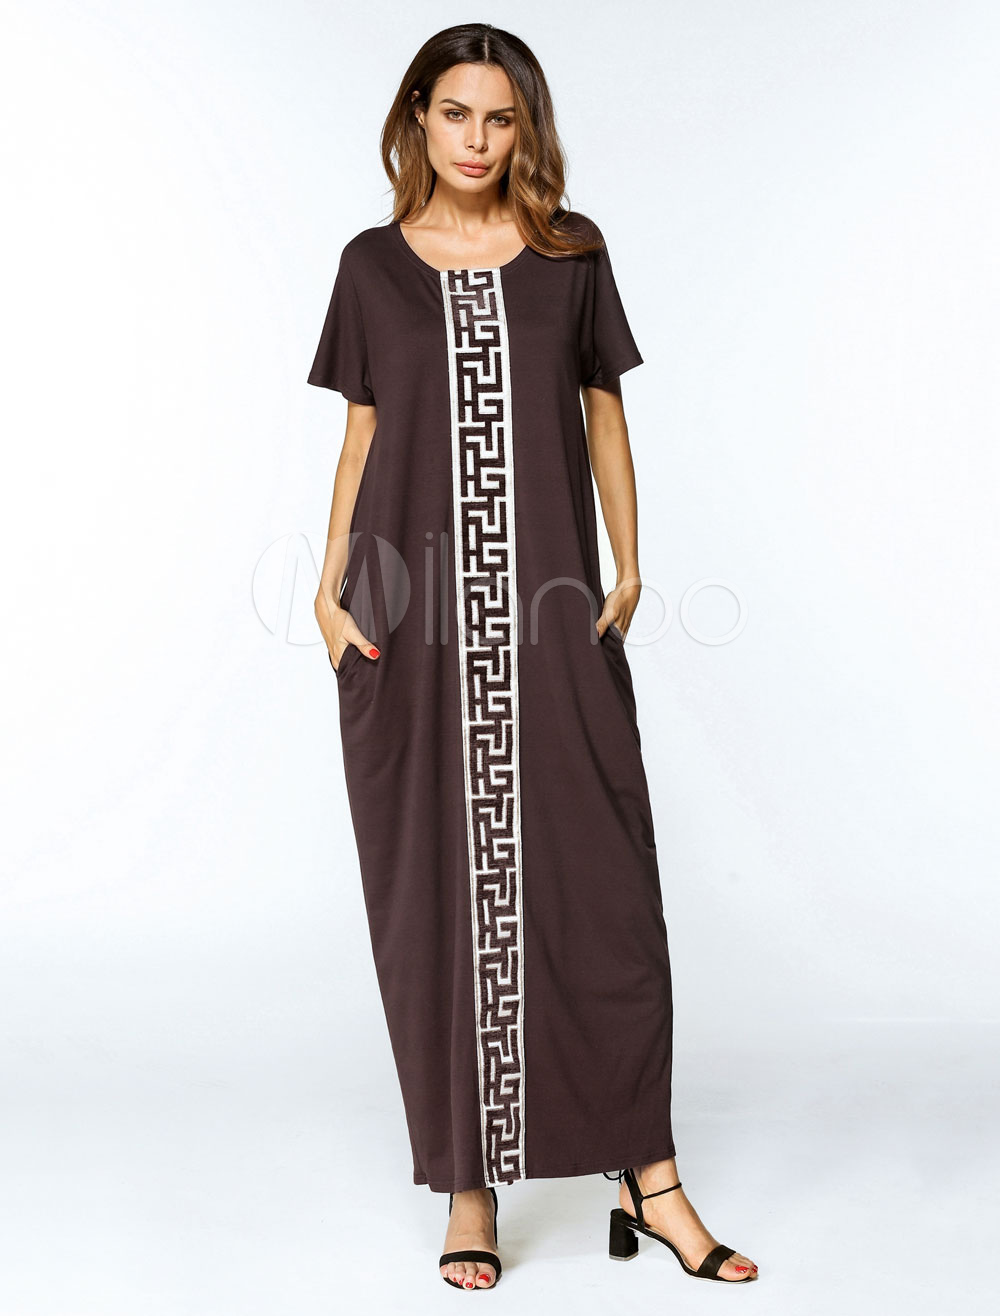 Women Kaftan Dress Tunic Dress Short Sleeve Oversized Jalabiya Dress (Women\\'s Clothing Arabian Clothing) photo